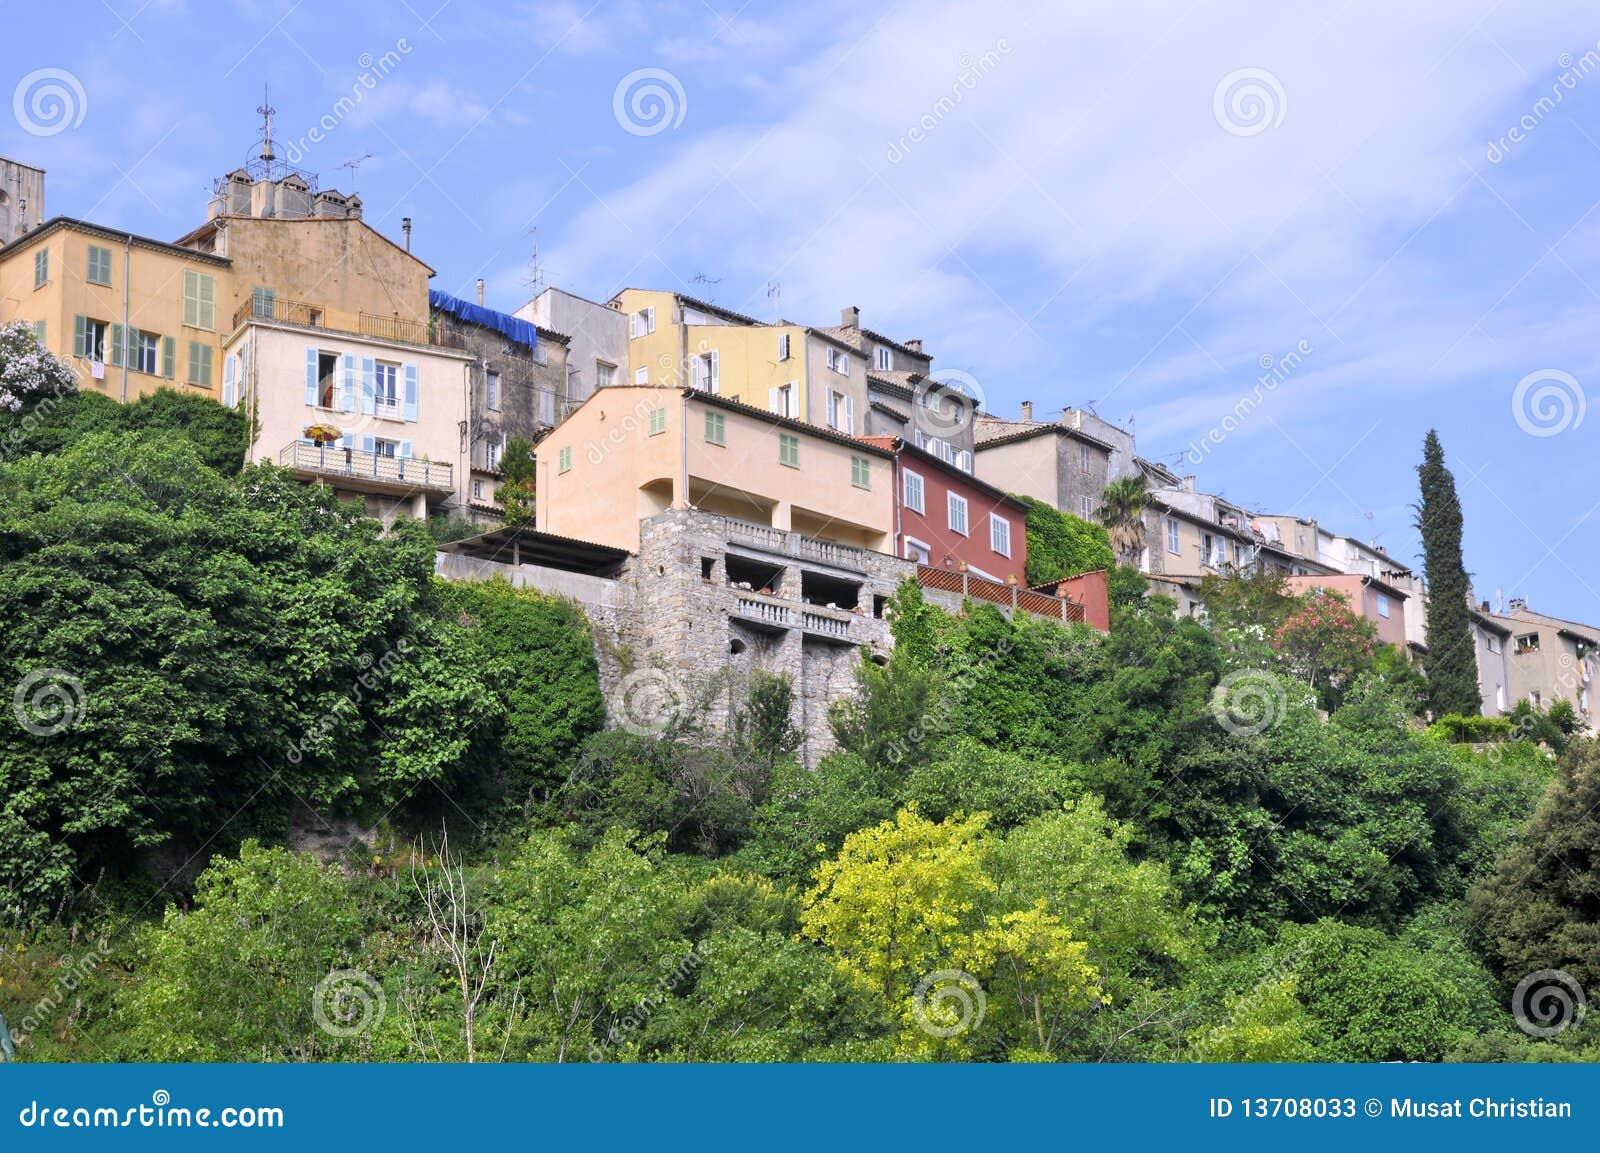 Biot France  city photos gallery : village biot france 13708033